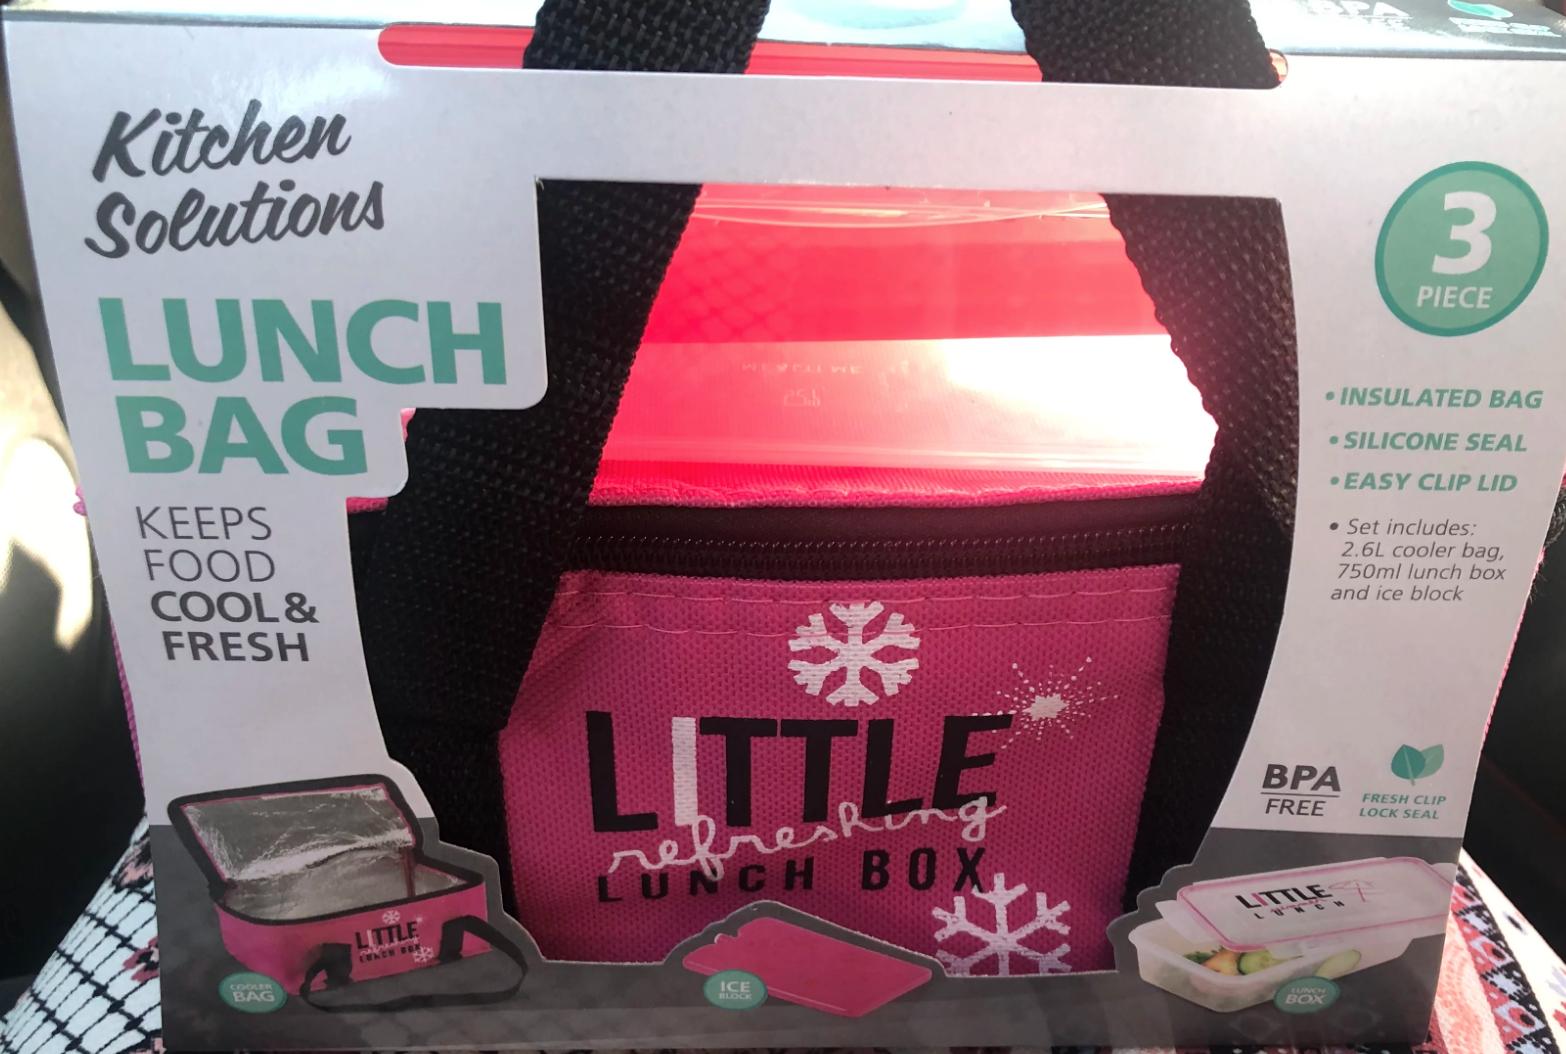 Kitchen Solutions Lunch Bag - £2.99 instore @ home bargains burnley